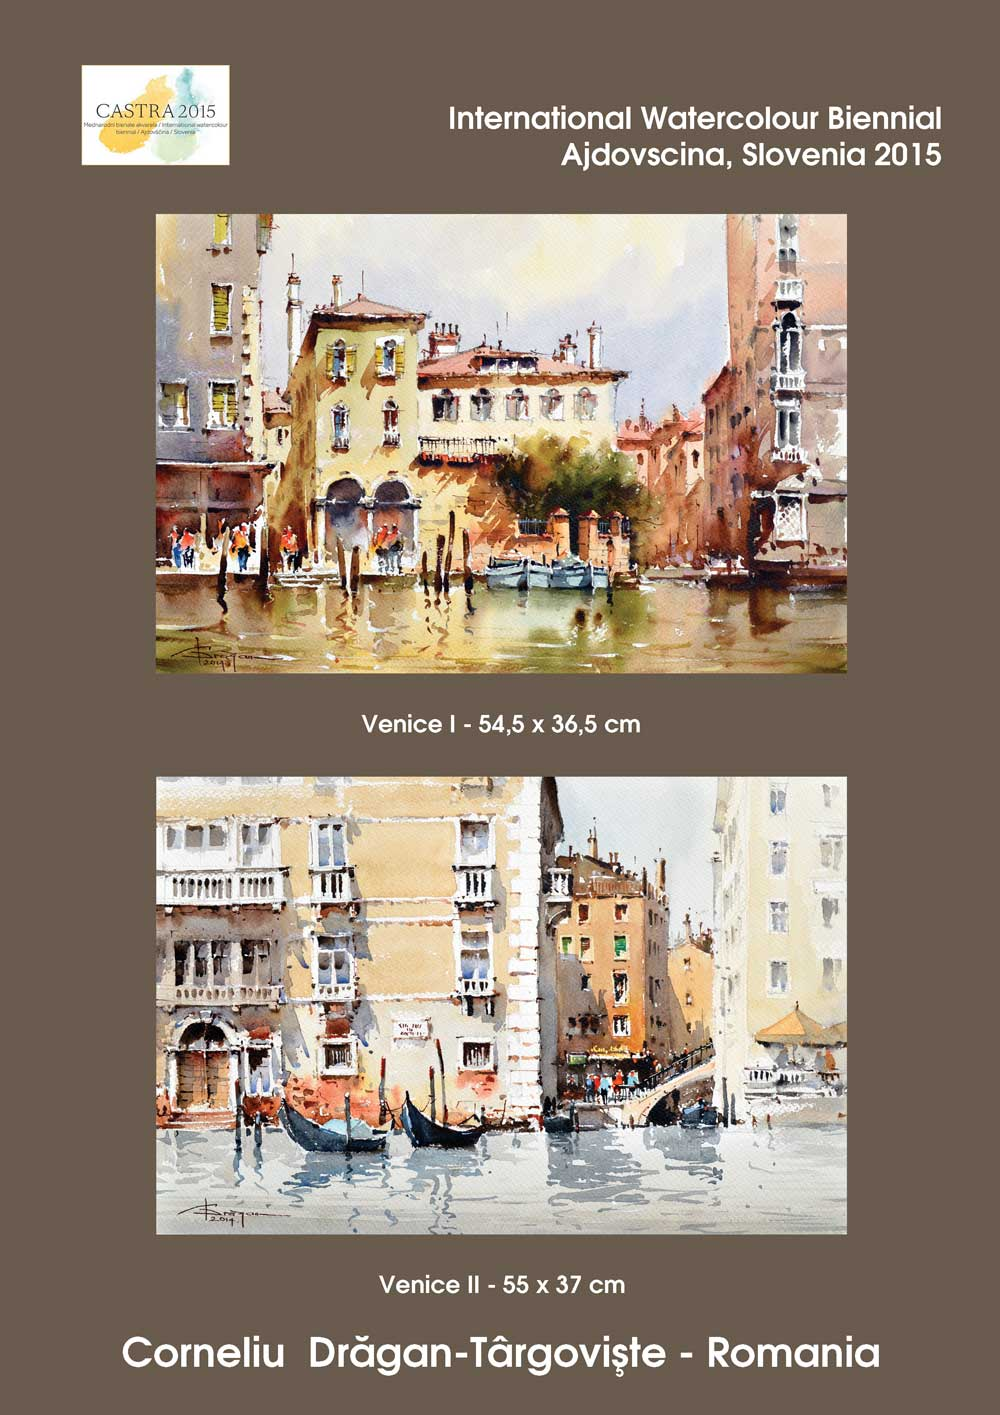 International-Watercolour-Biennial-CASTRA-2015--Slovenia Corneliu Dragan Targoviste